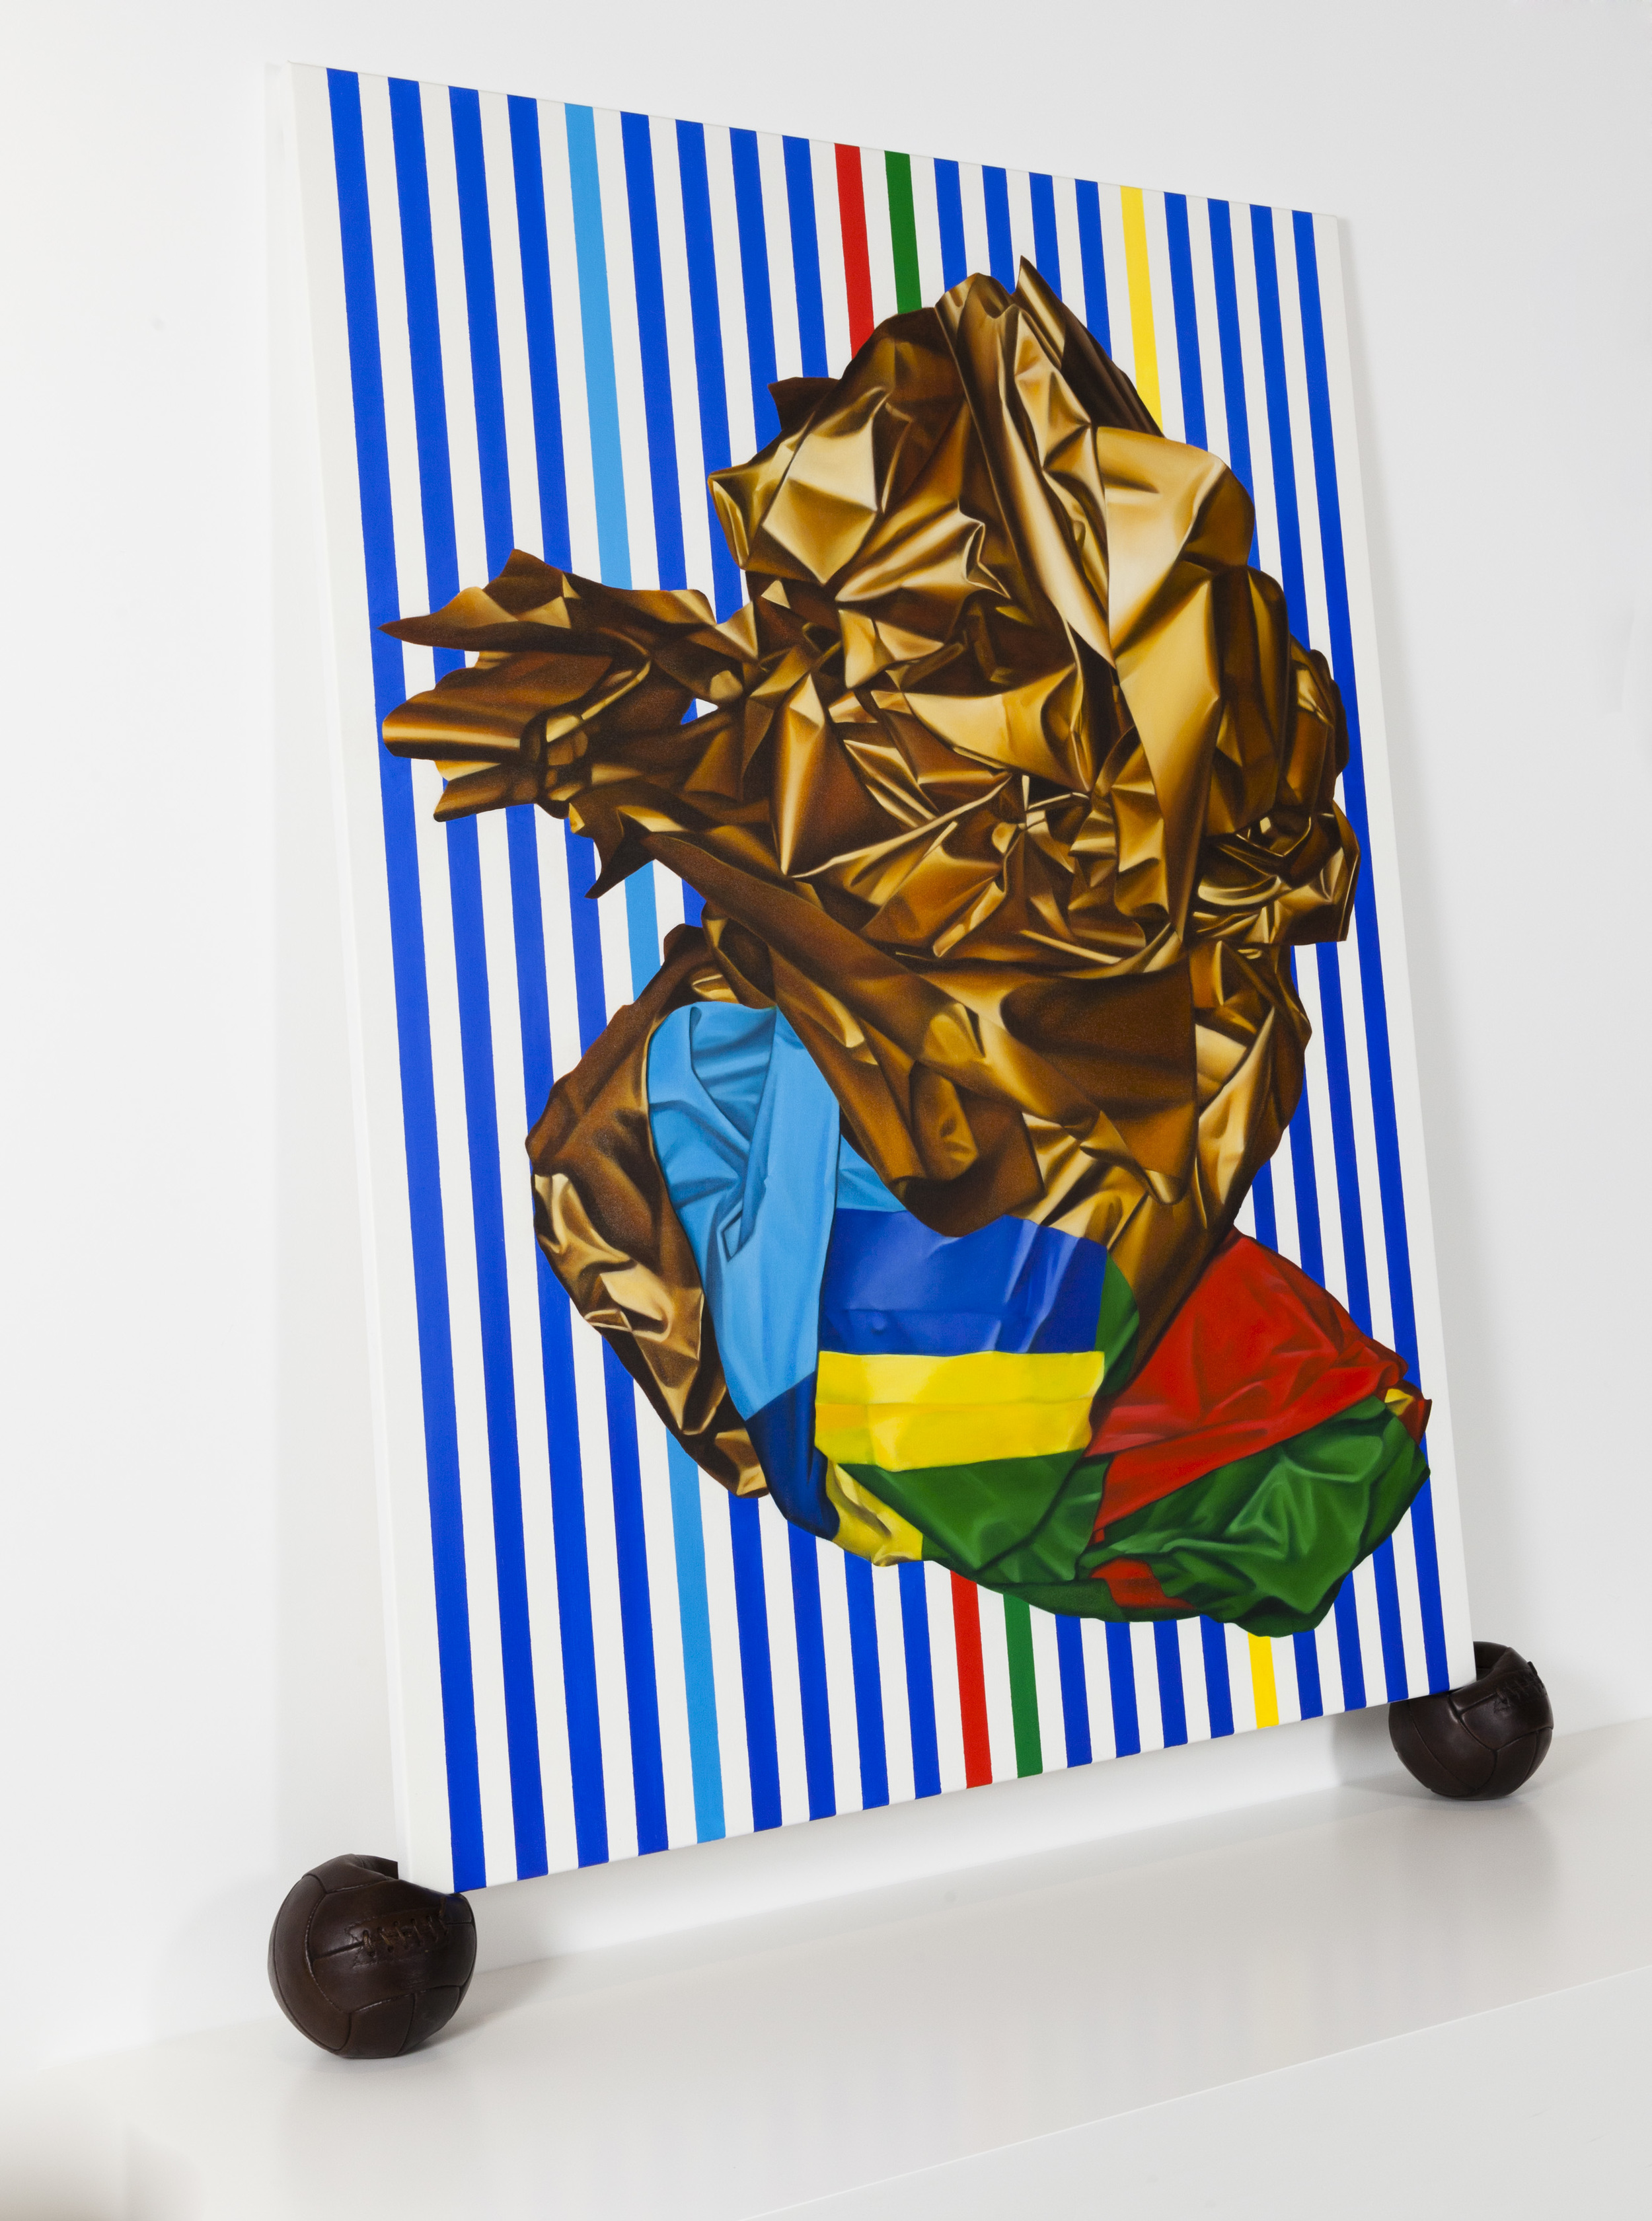 Copa, (Artbank/Gertrude Contemporary commission) 2015. Oil on canvas, cast bronze footballs.